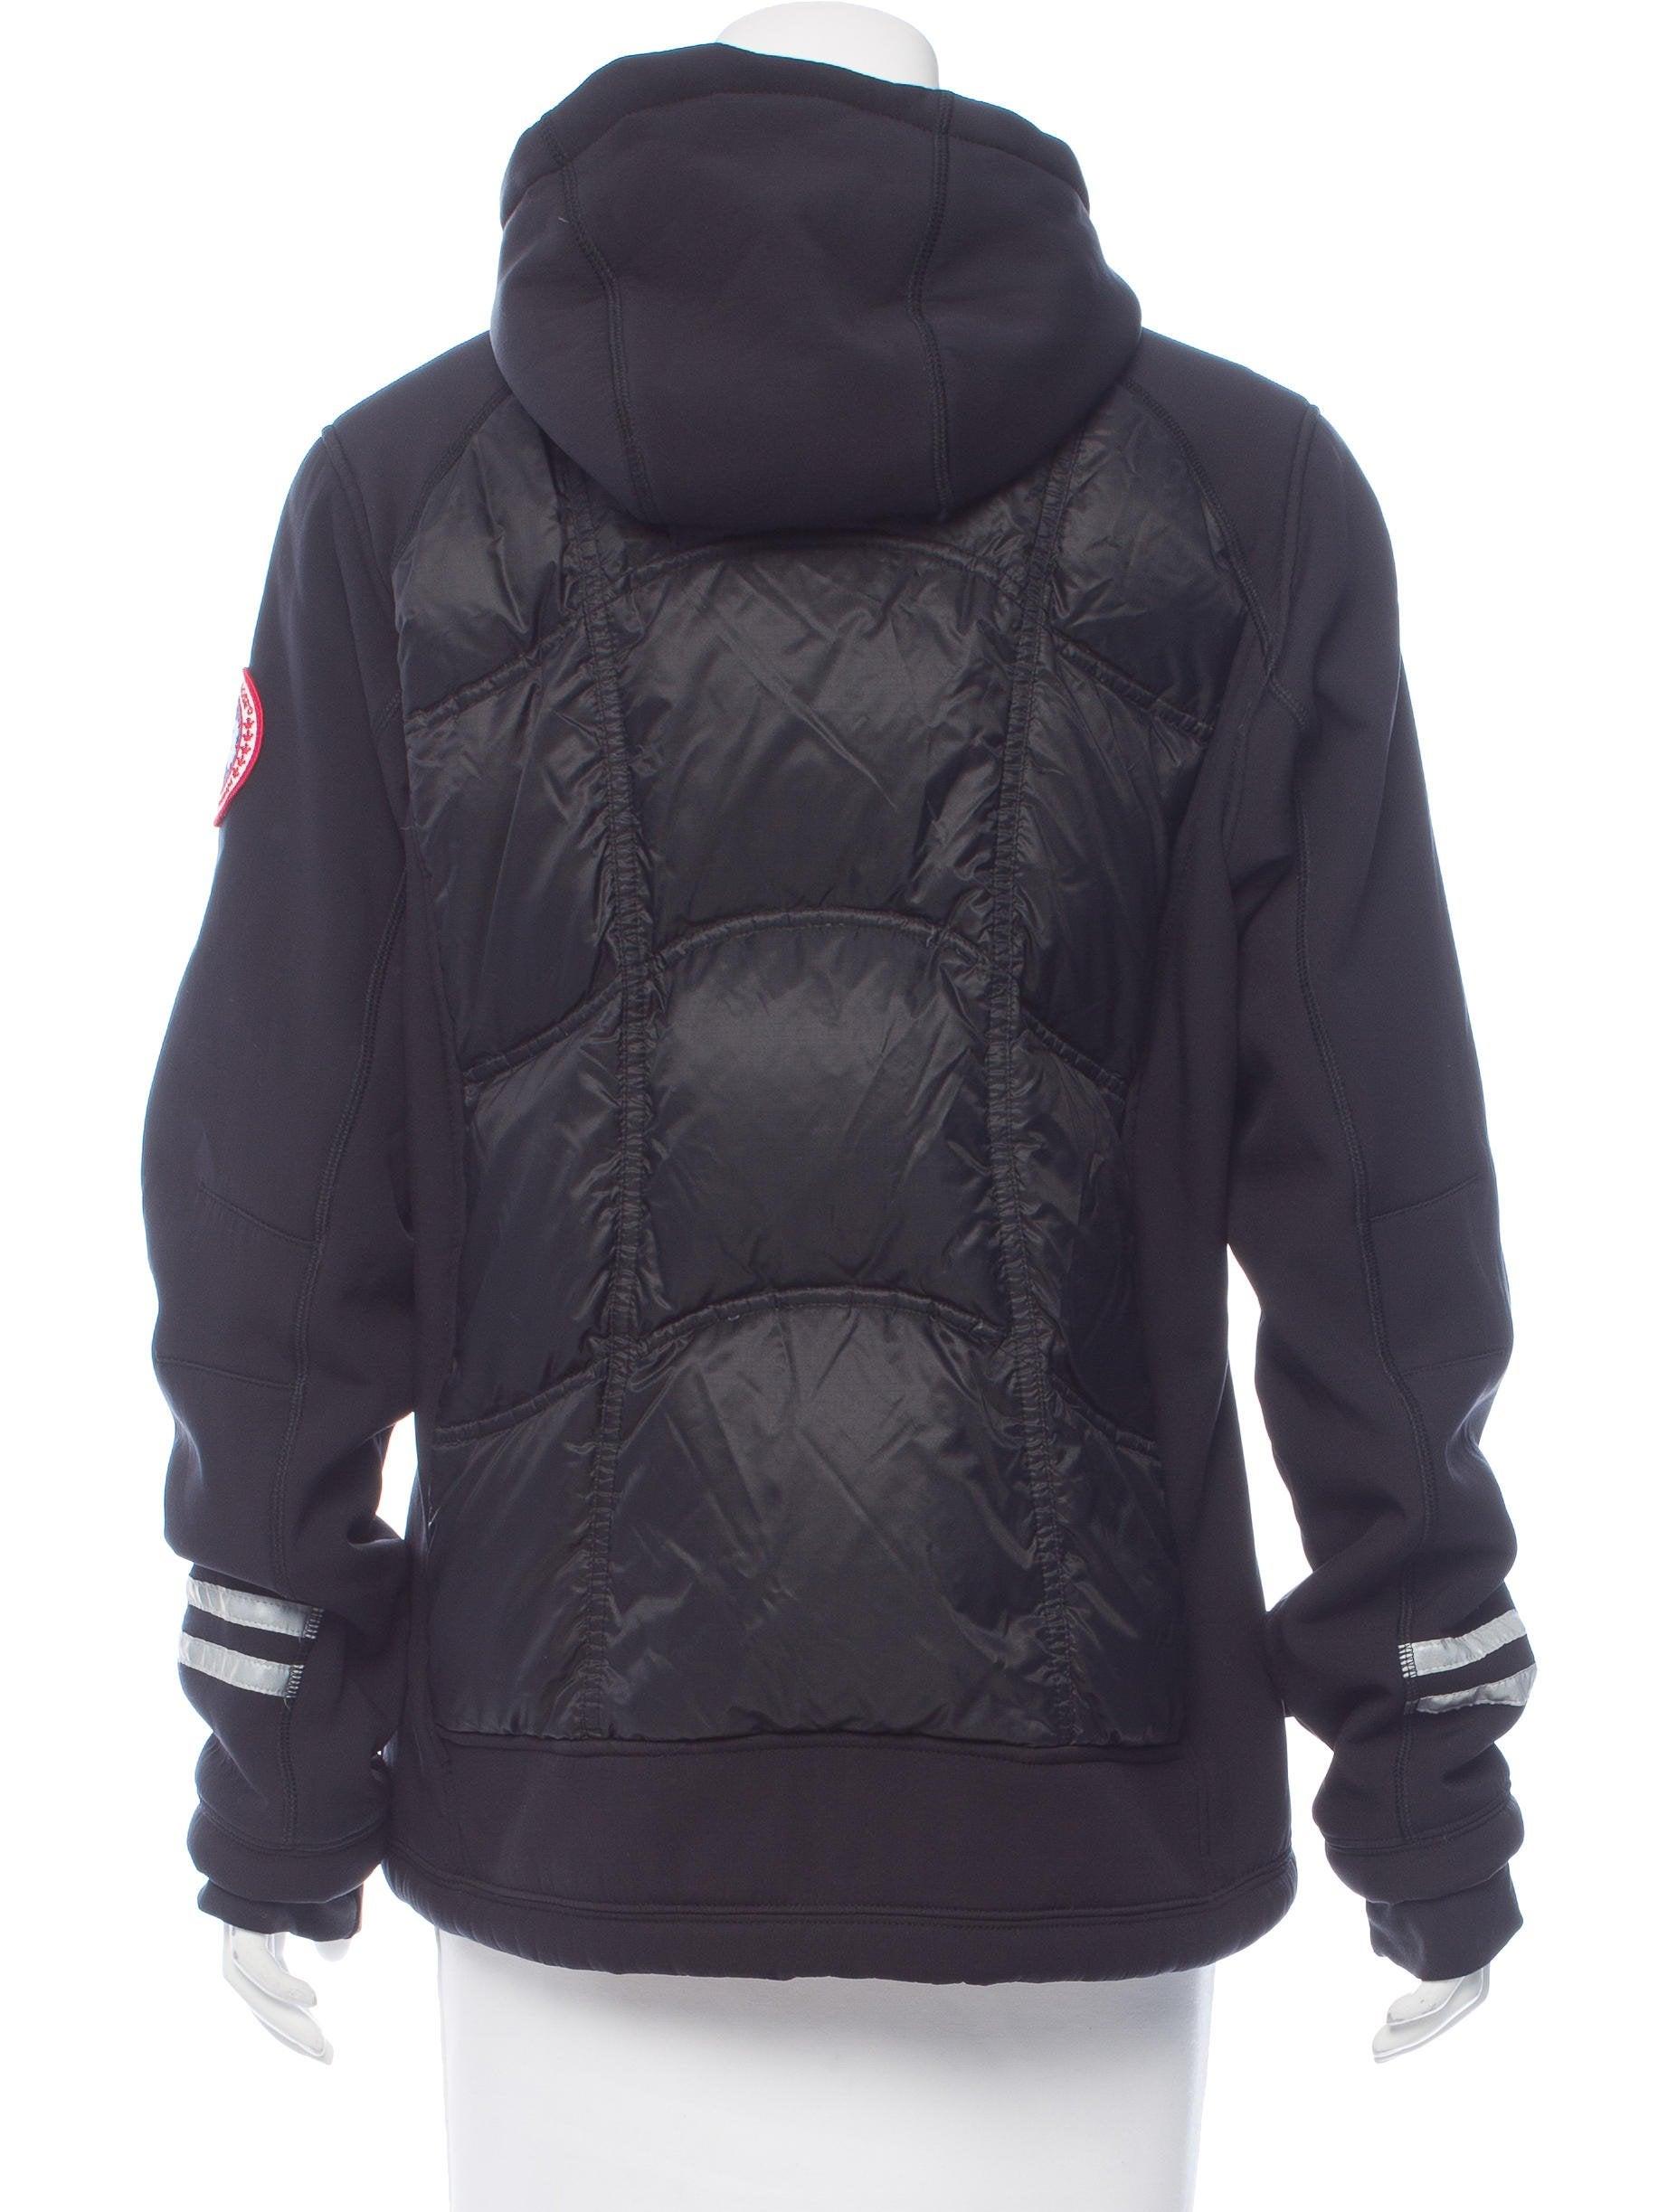 Canada Goose Hooded Down Jacket Clothing Cdo20655